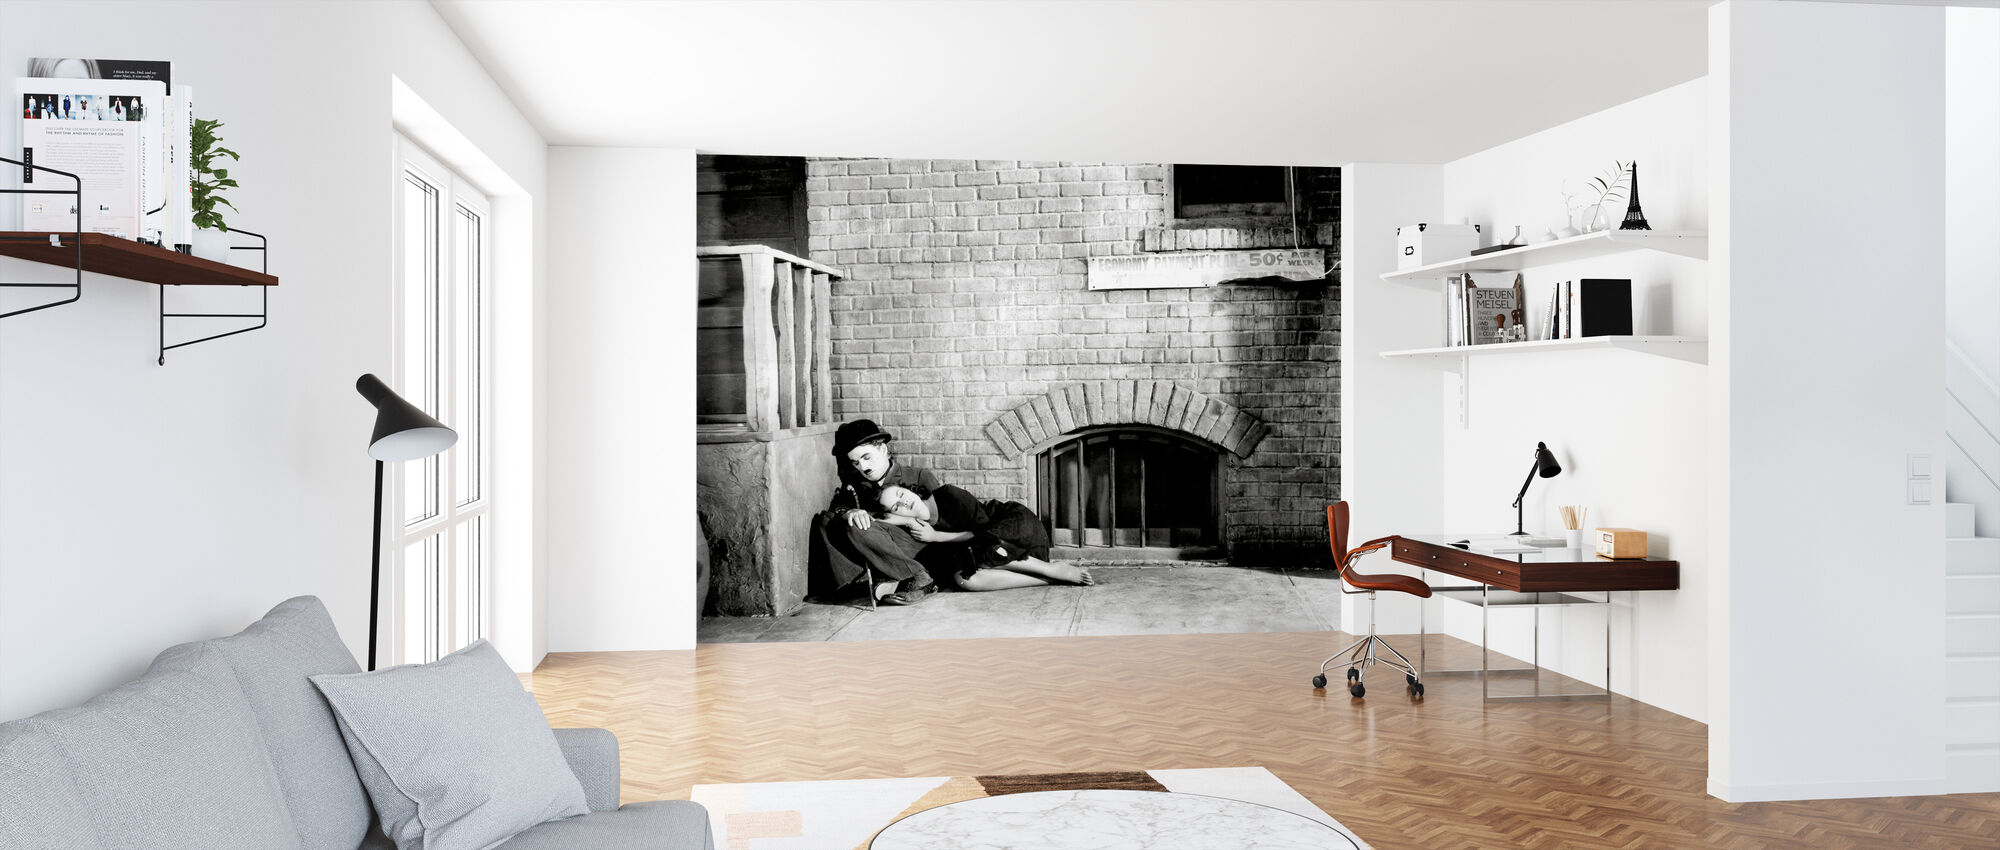 Charlie Chaplin ja Paulette Goddard Modern Times - Tapetti - Toimisto